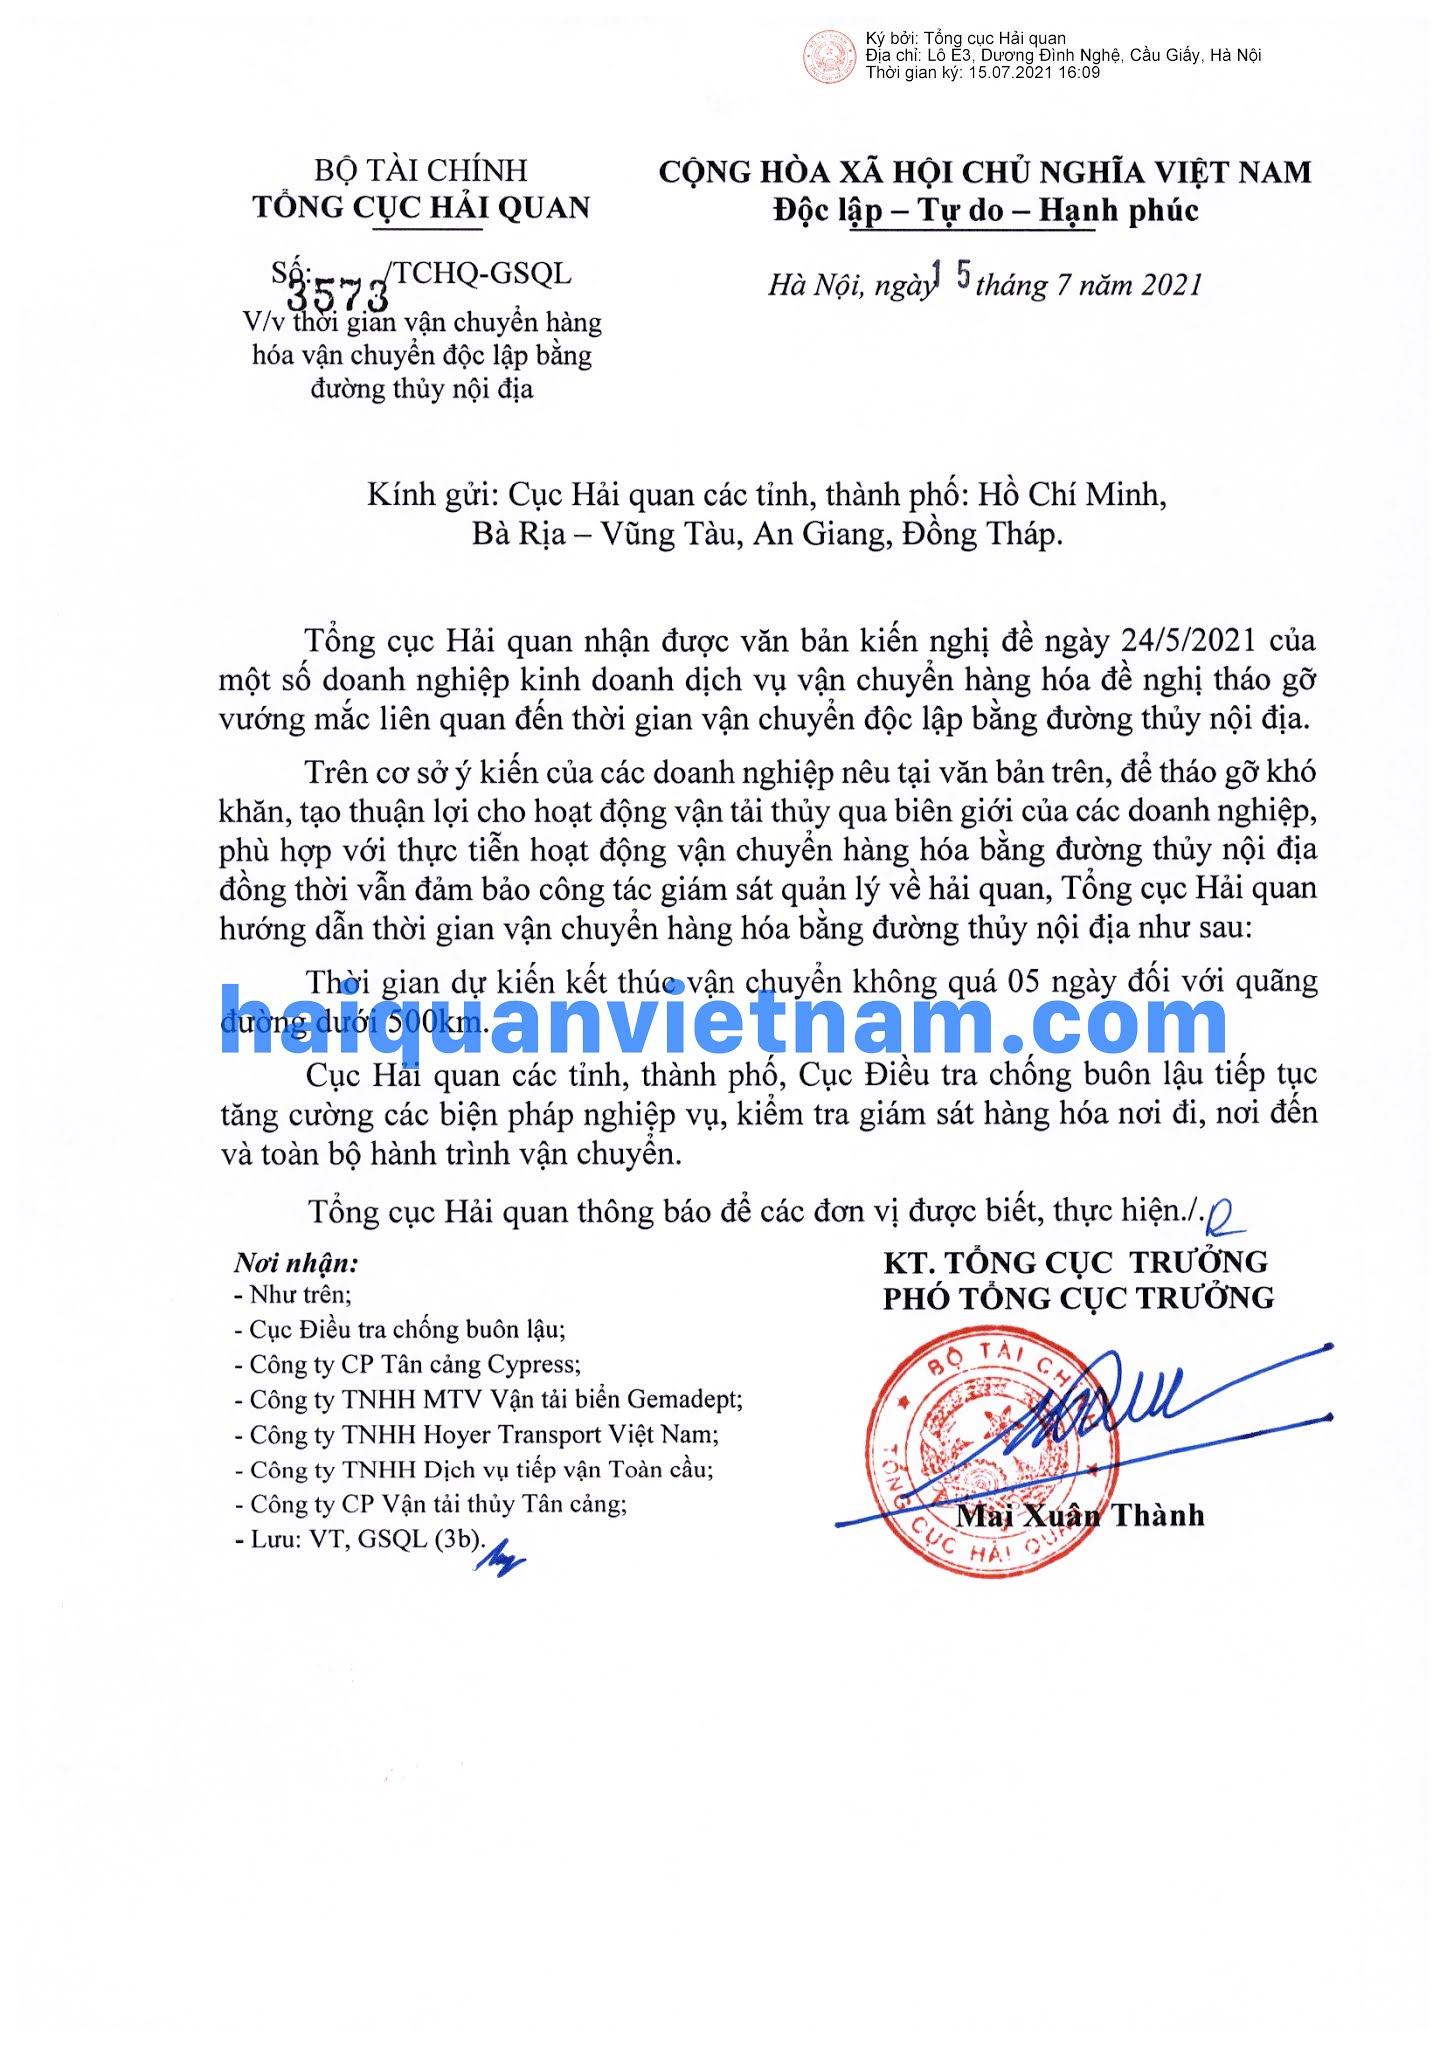 [Image: 210715%2B-%2B3573-TCHQ-GSQL_haiquanvietnam_01.jpg]